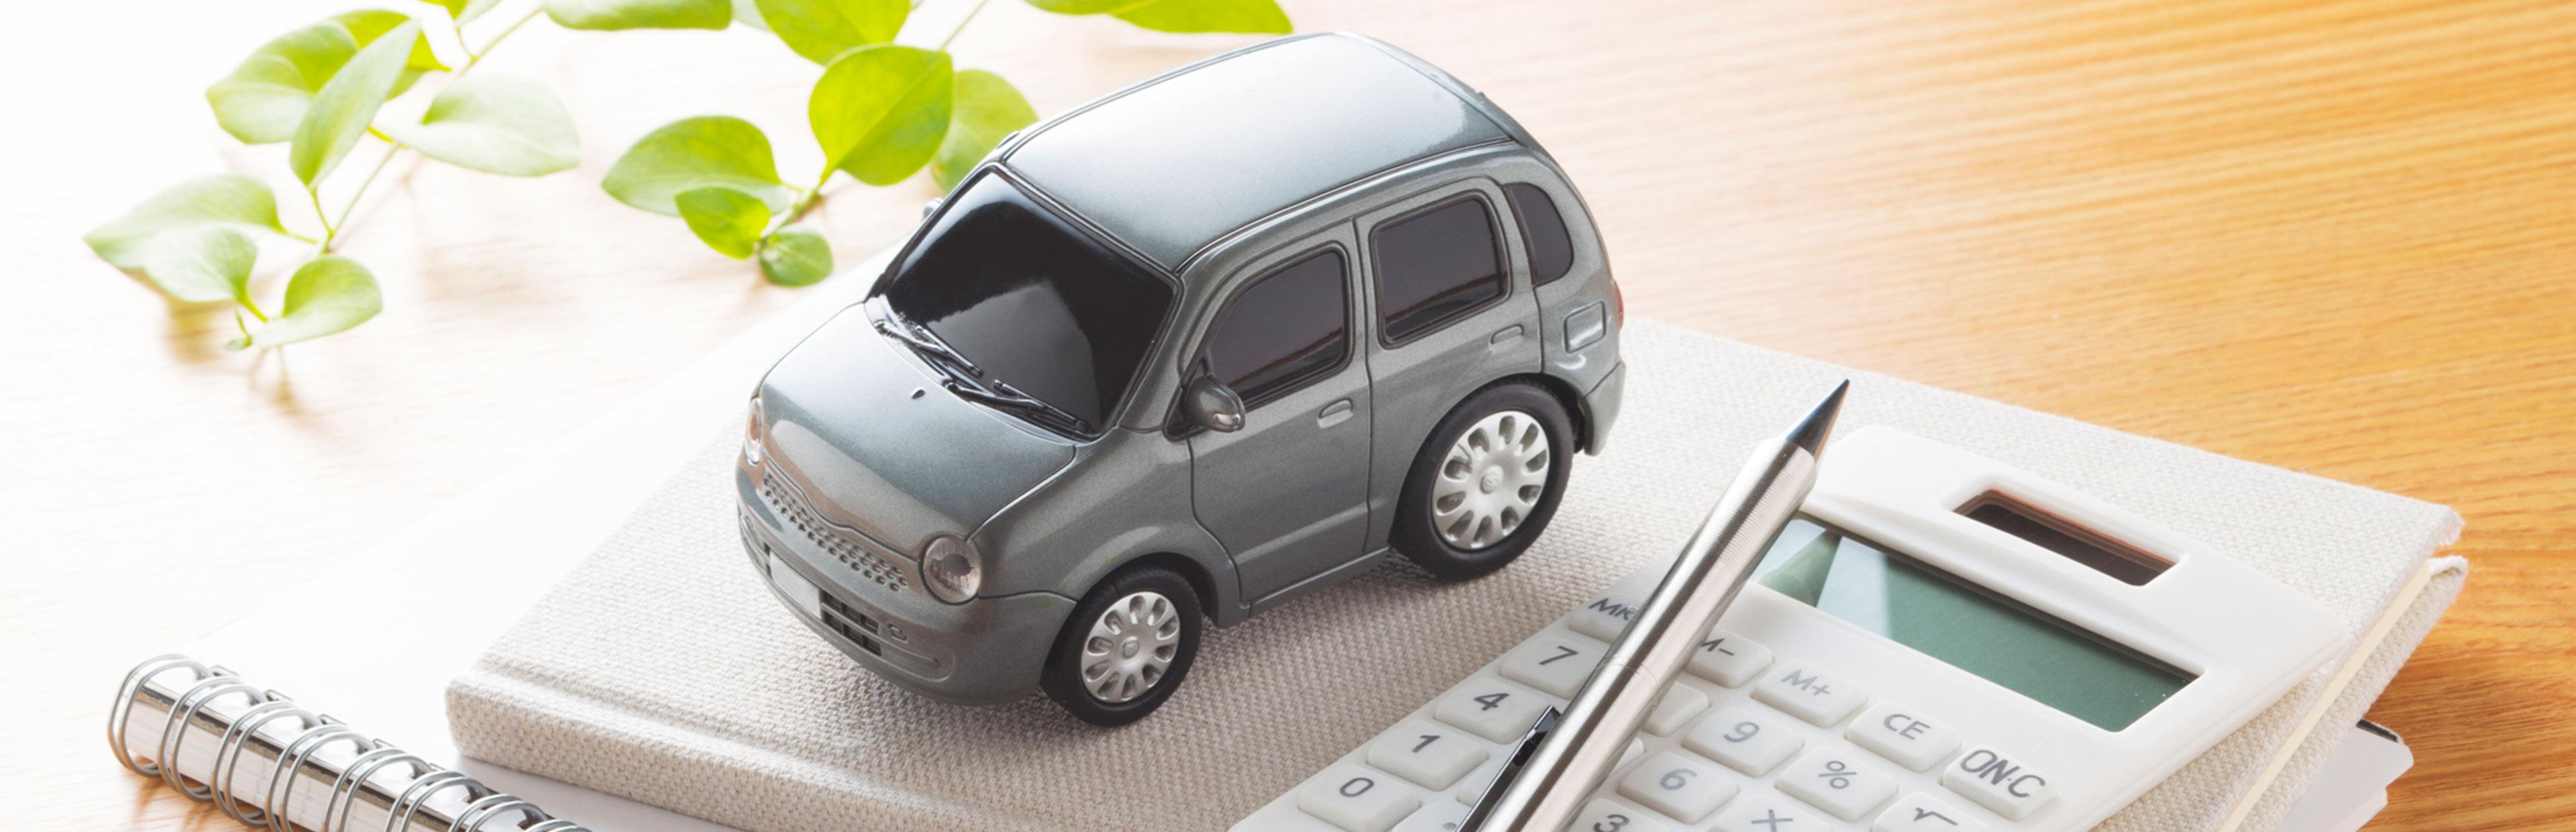 Loan calculator | national savings bank.